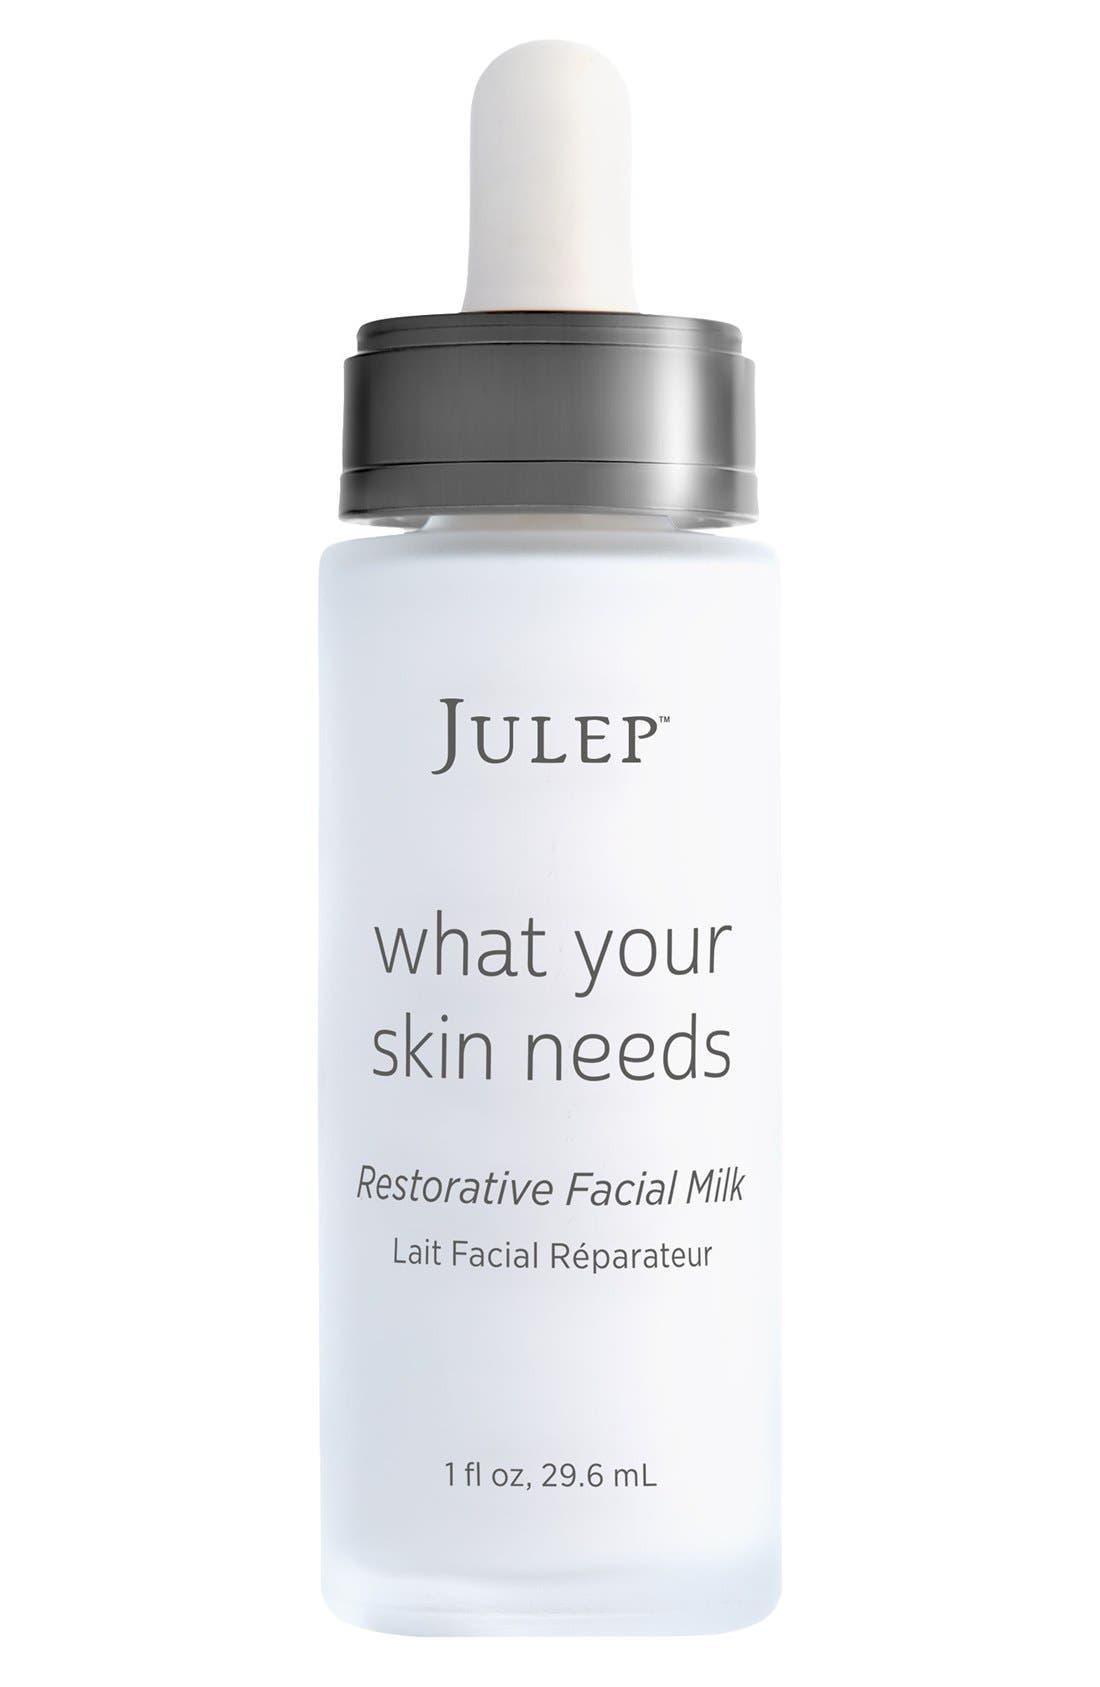 Julep™ What Your Skin Needs Restorative Facial Milk